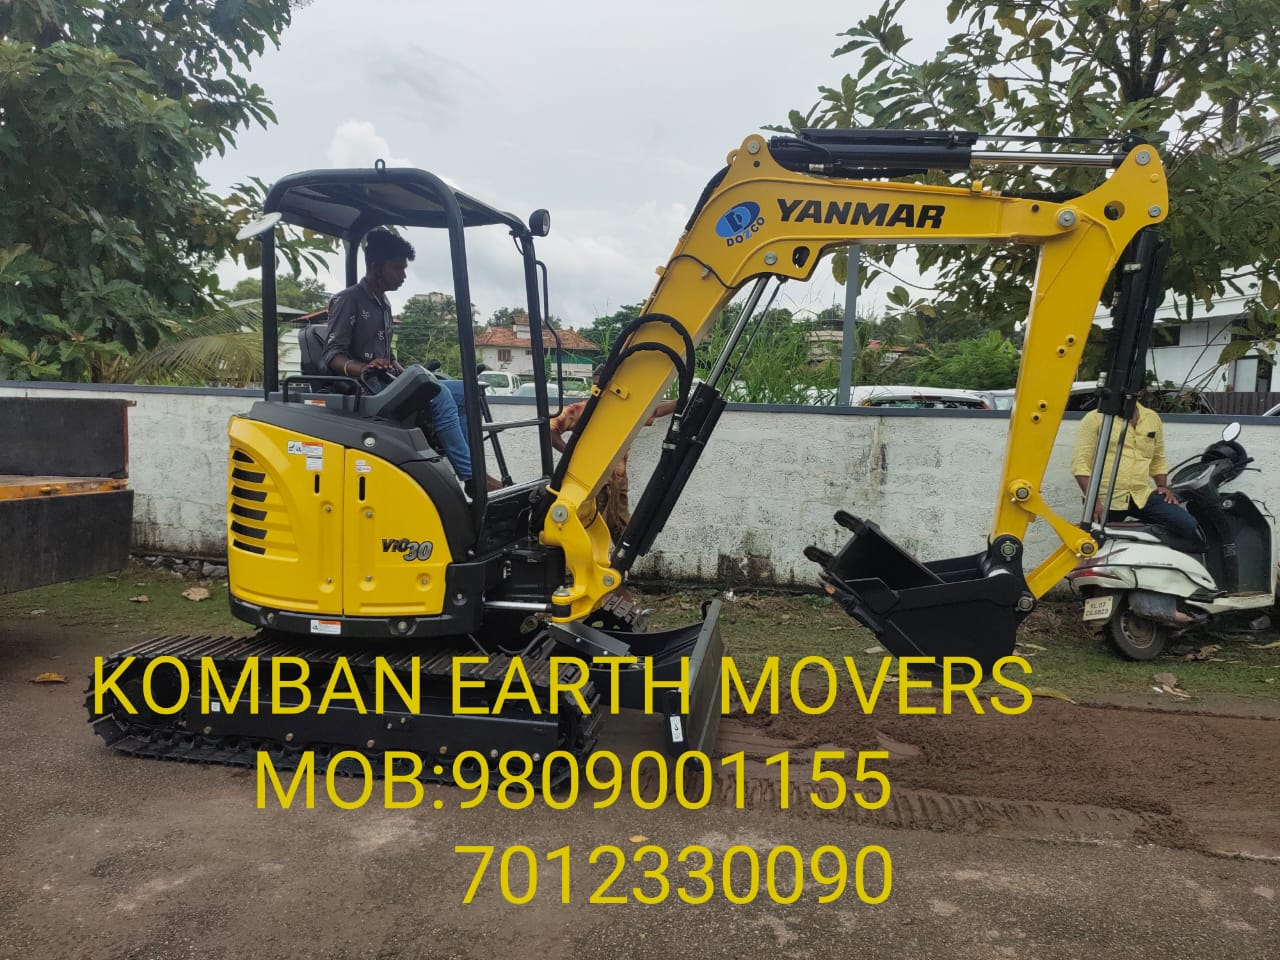 Komban Earth Movers